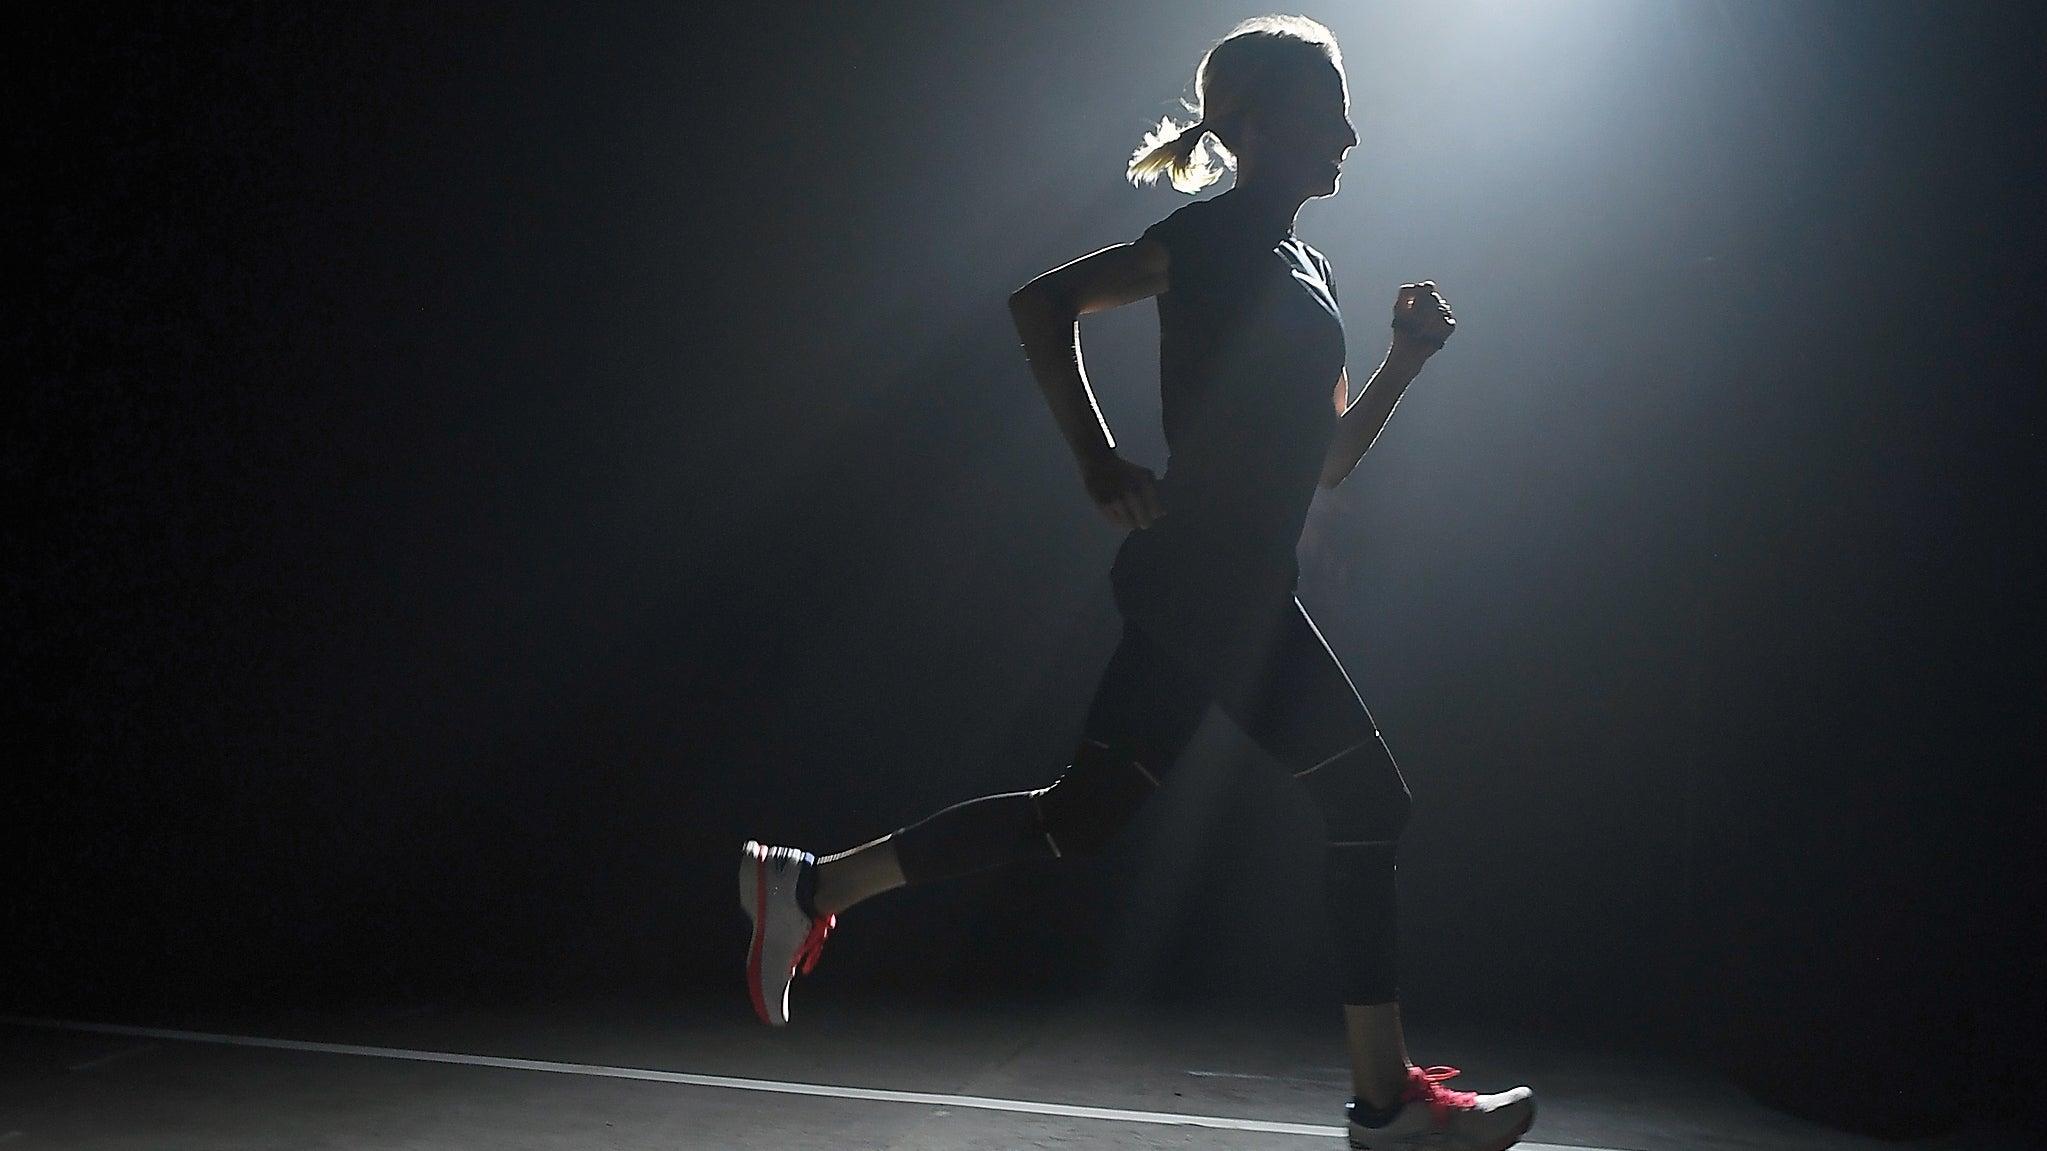 Deena Kastor running on a darkly lit indoor track